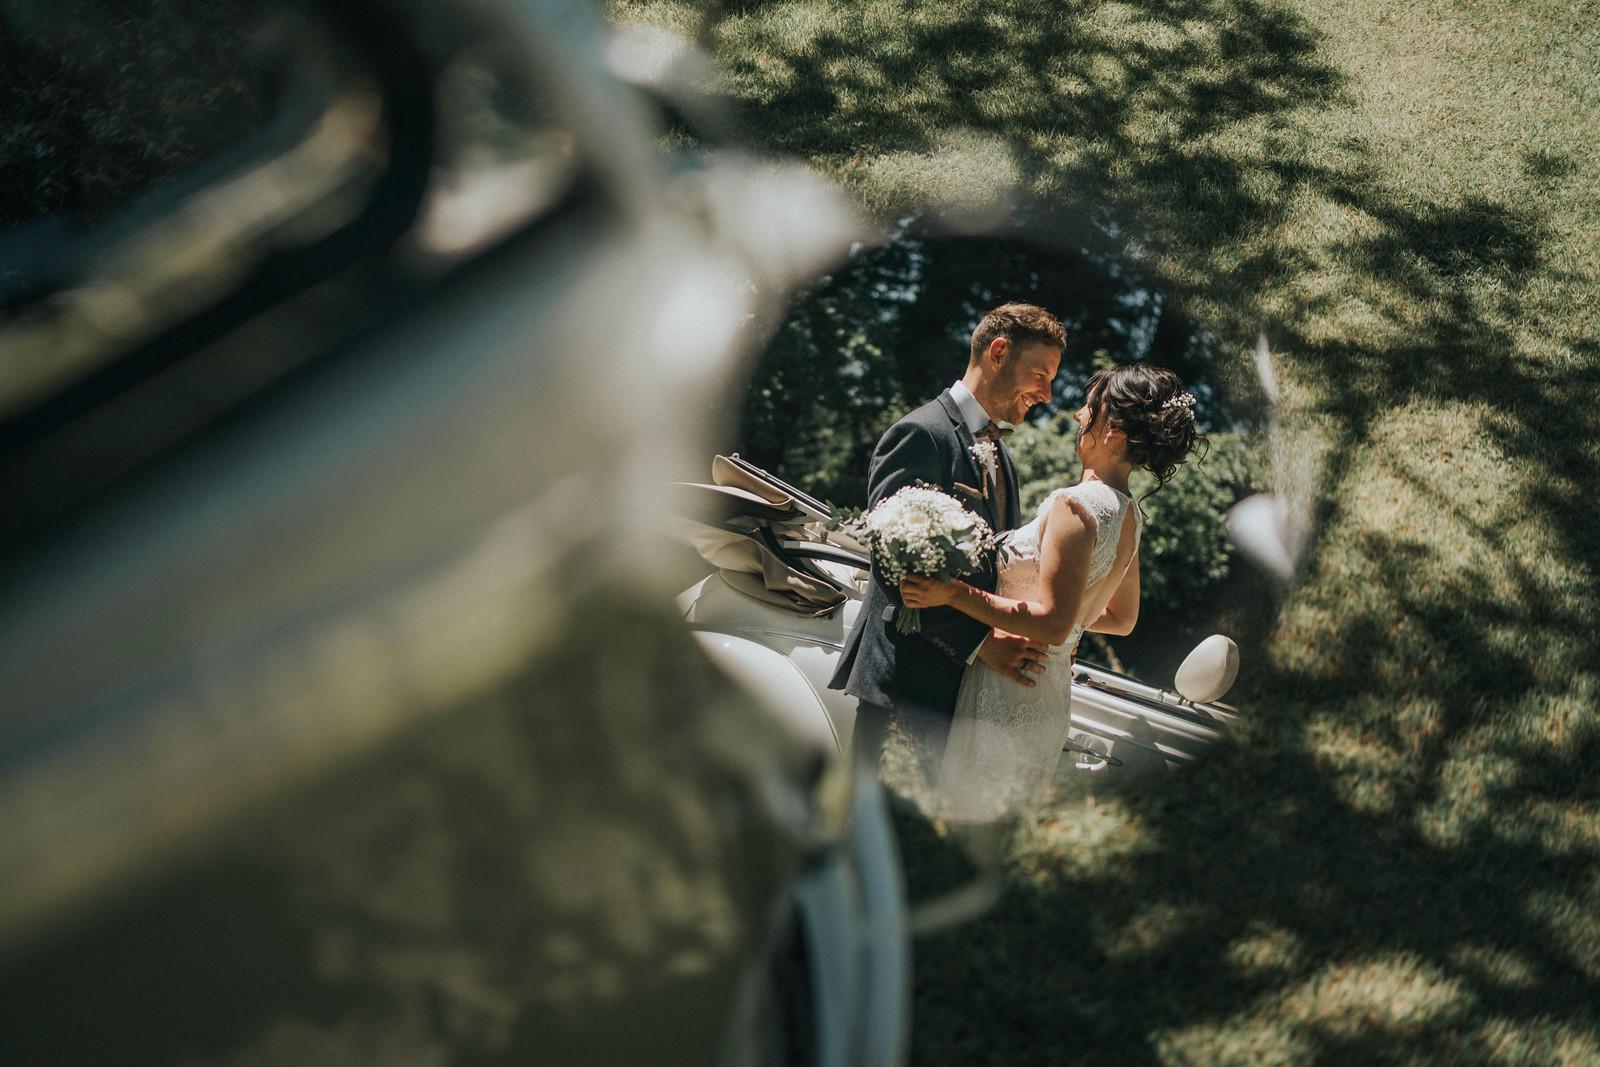 Unique and Creative Wedding Photo of Bride and Groom